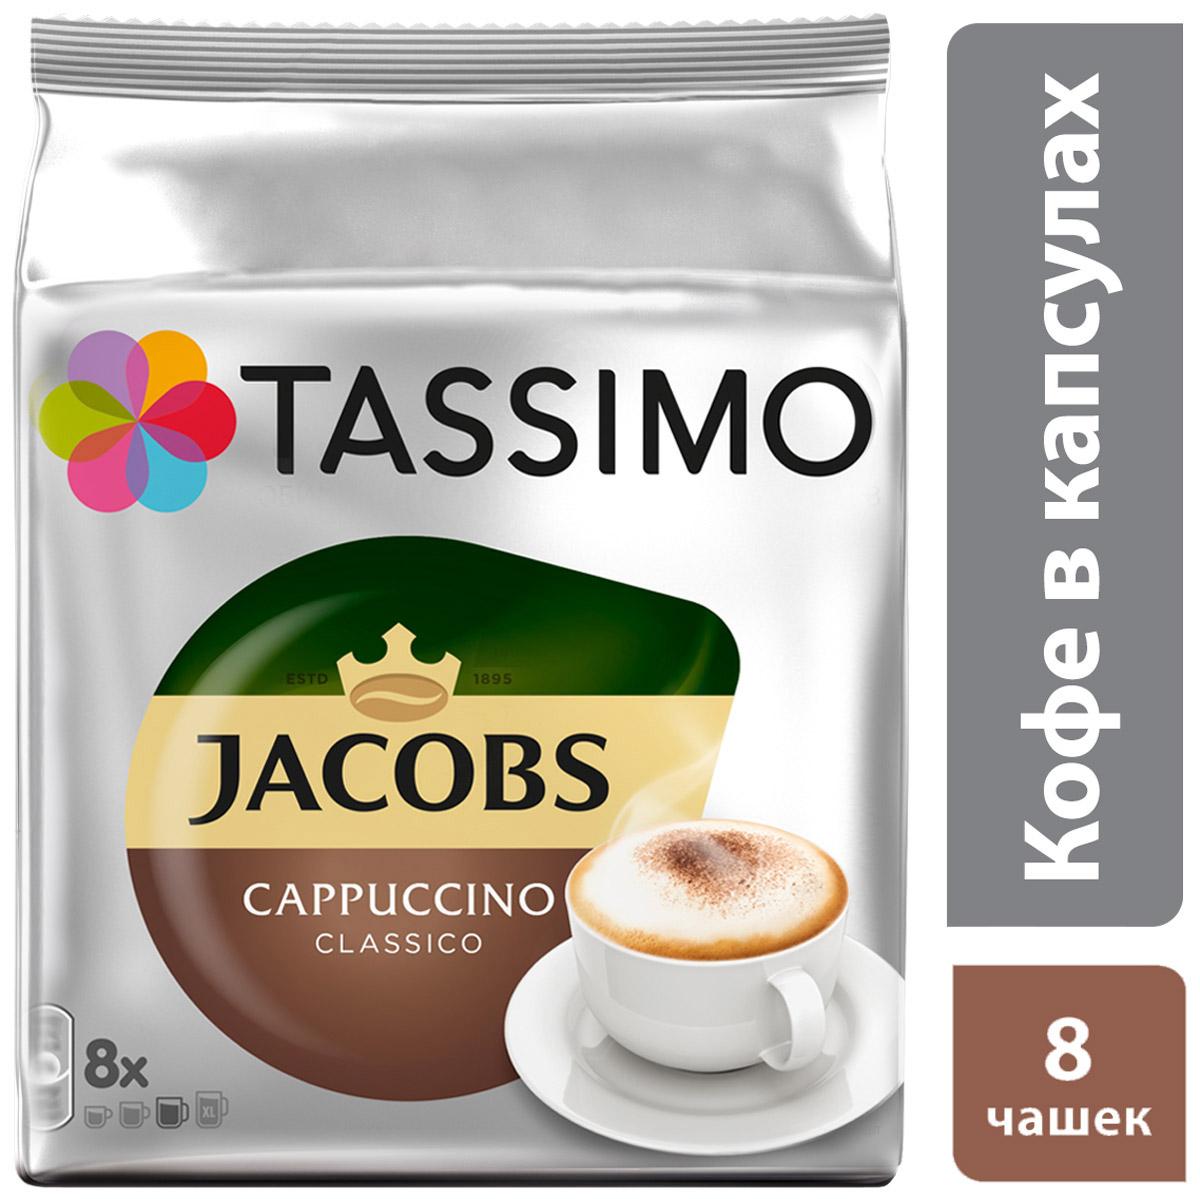 Tassimo Jacobs Cappuccino кофе в капсулах, 260 г tassimo jacobs espresso classico кофе в капсулах 16 шт